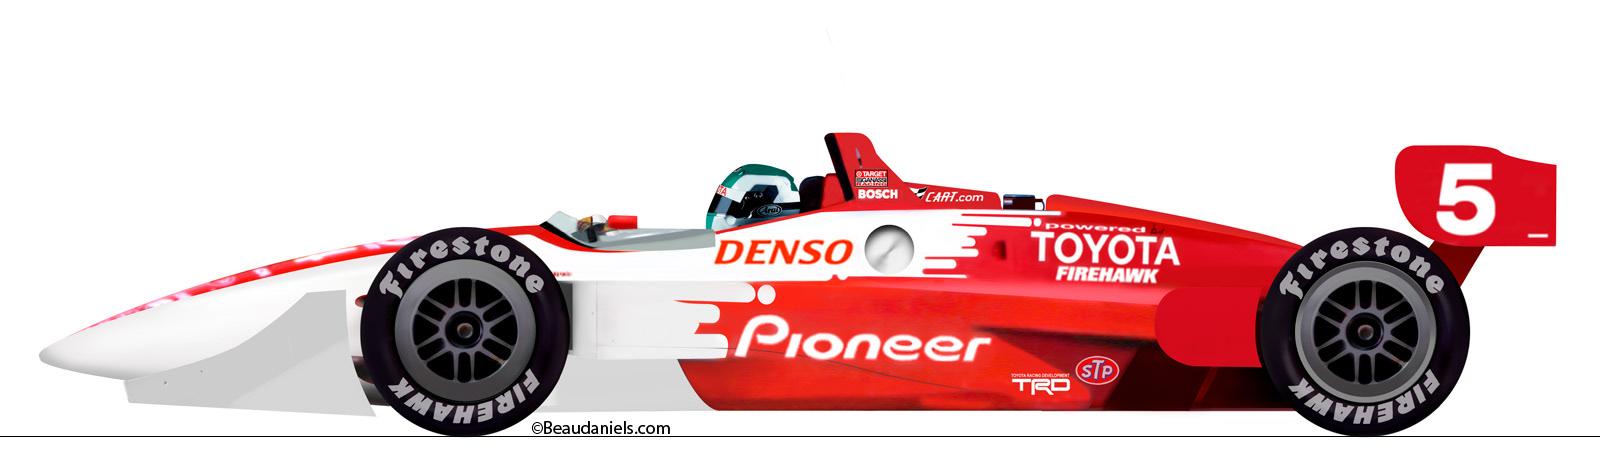 Technical illustration, Beau and Alan Daniels. - Toyota Race Car ...